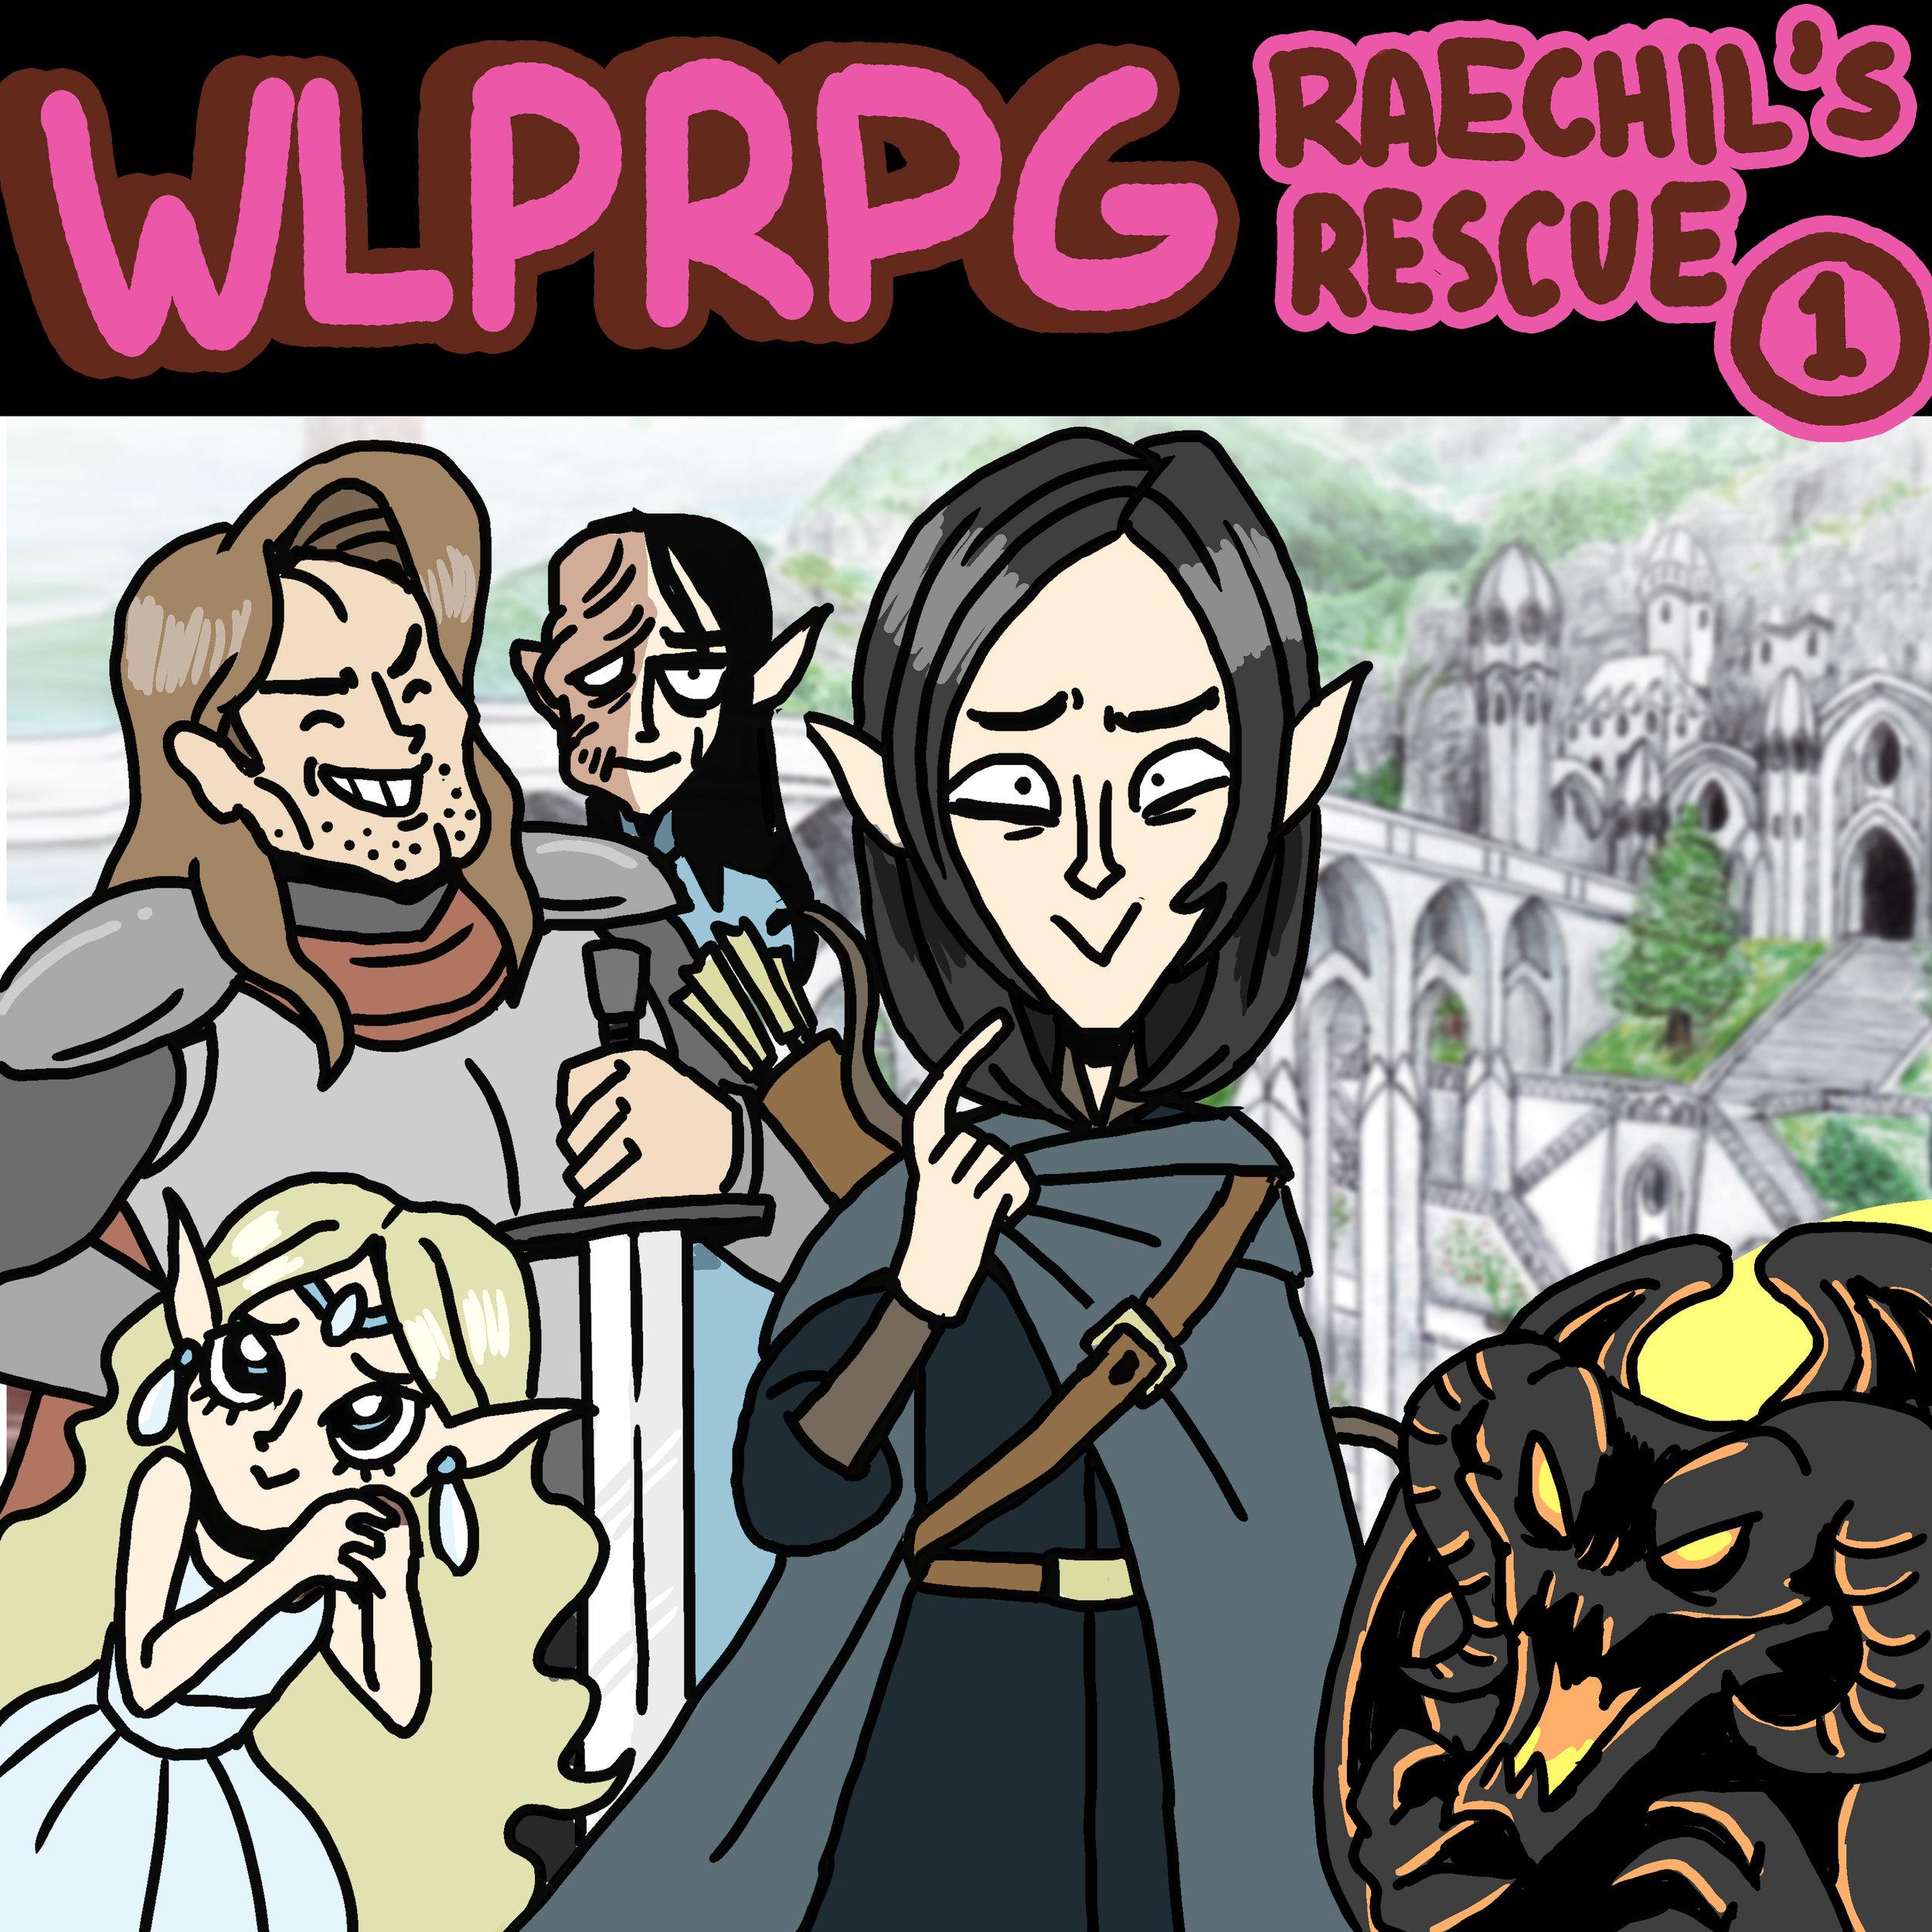 Raechil's Rescue #1 Illustration